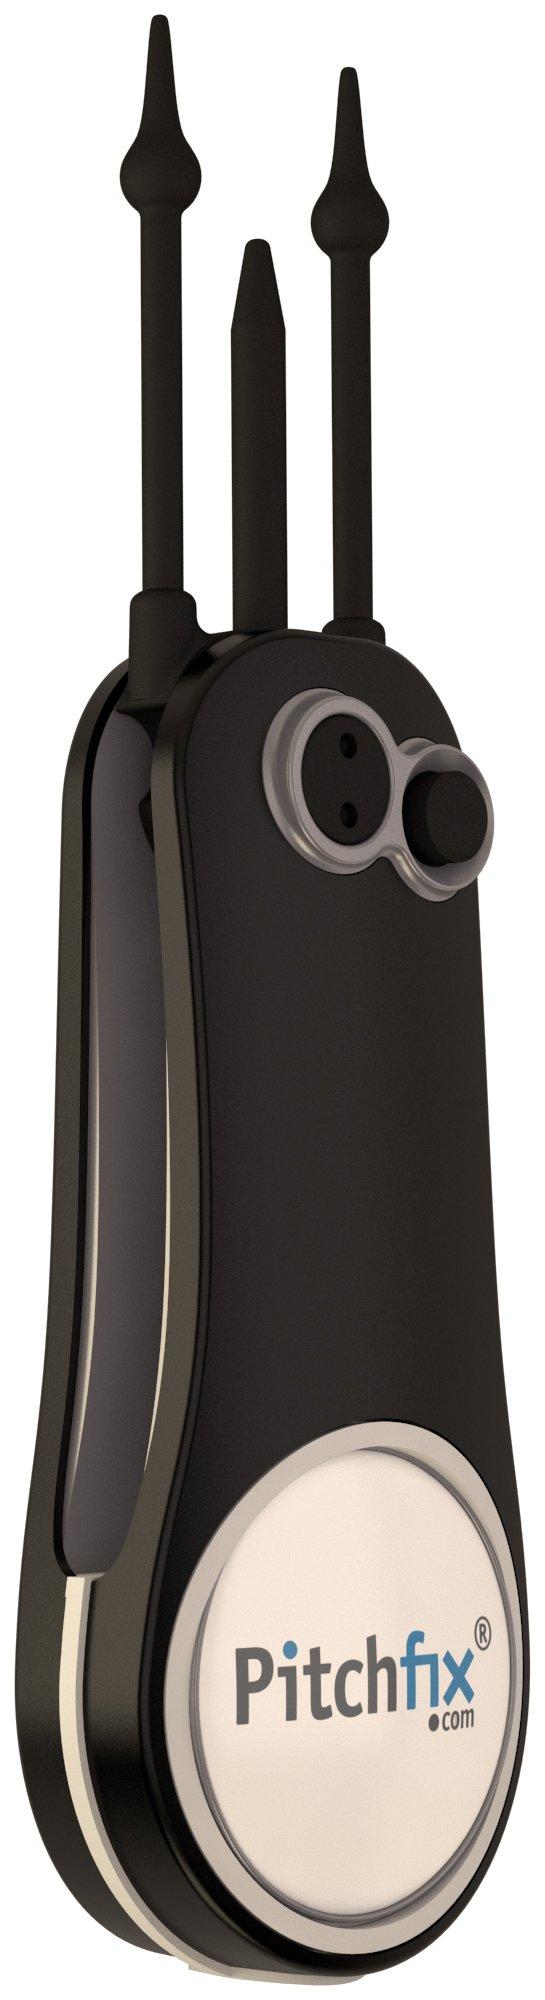 Pitchfix Fusion 2.5 Pin, Black/Silver by Pitchfix (Image #1)